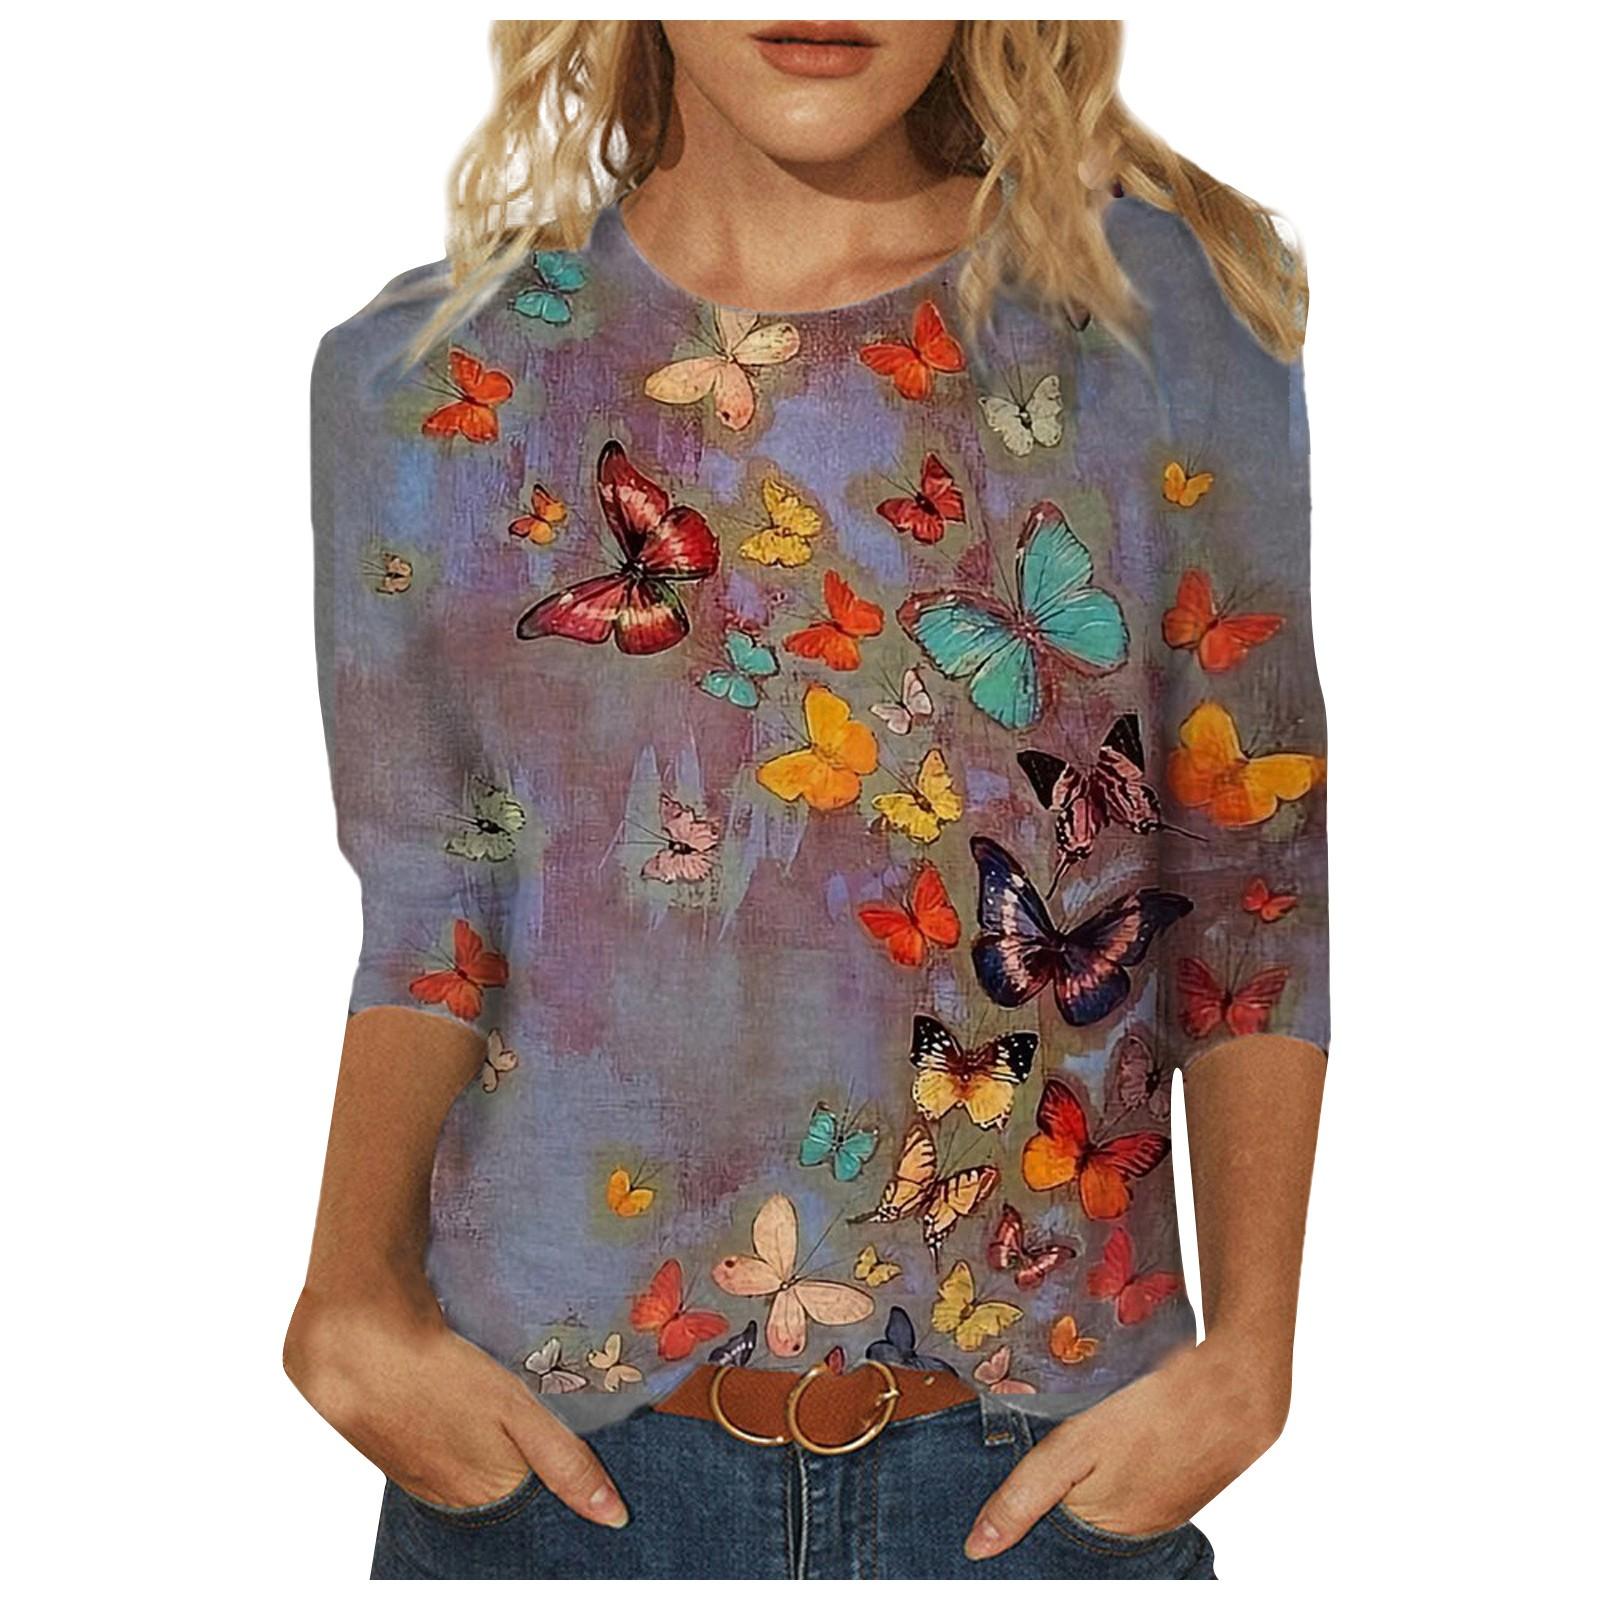 4# Women's oversize shirt Spring Printed Mid length sleeves Blouses Crew Neck harajuku Tee Tops Blouses Tupper Garment топ